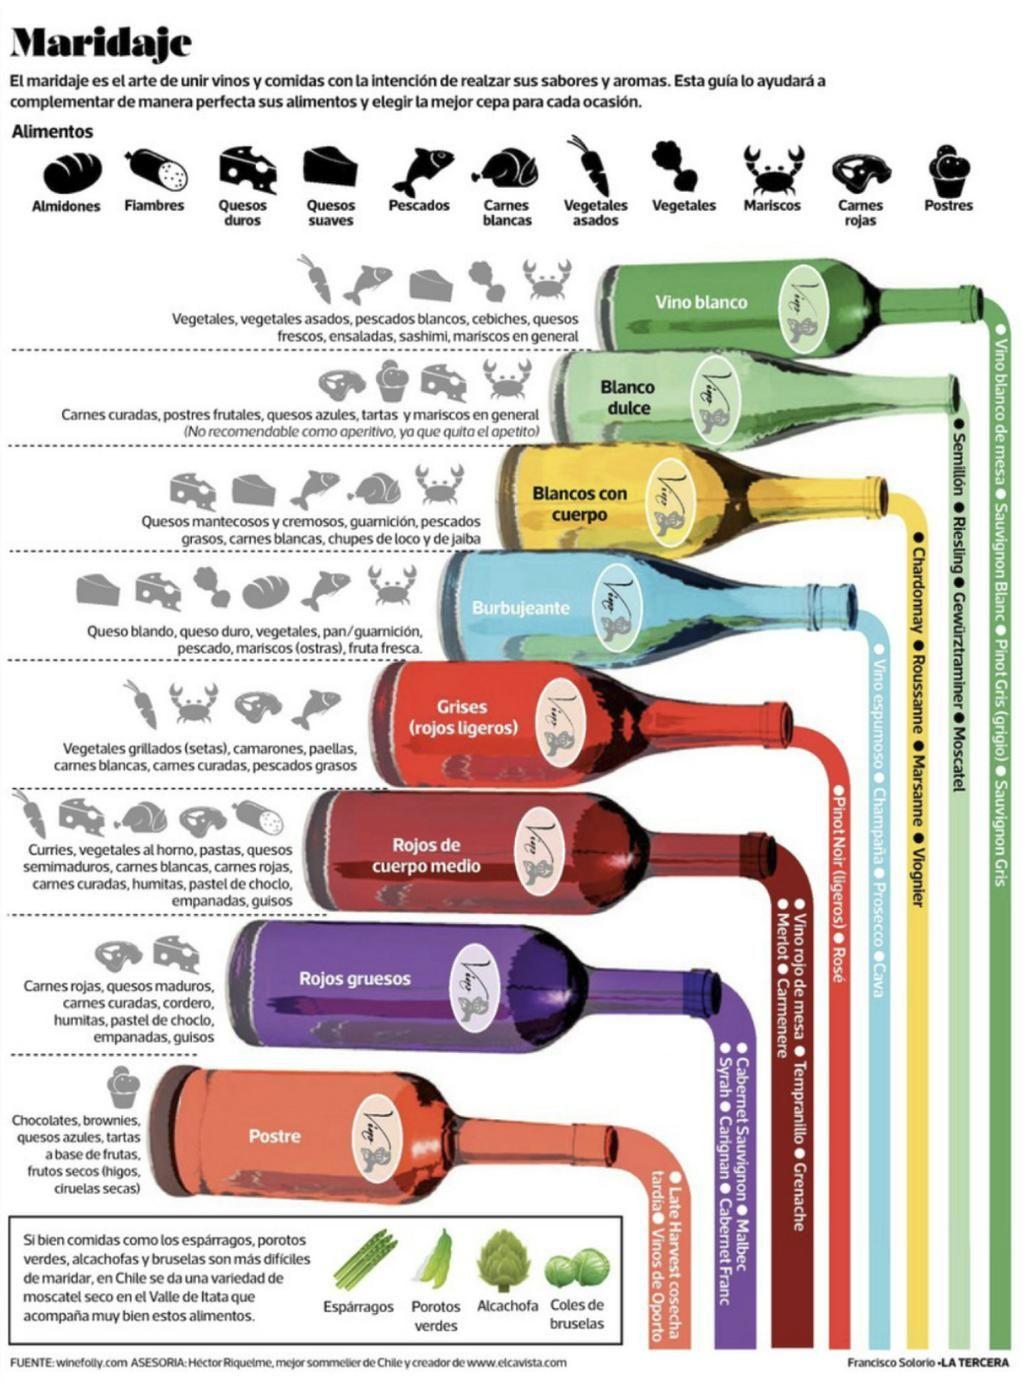 Bodegas Cepa 21 Cepa21bodegas Wine Drinks Wine And Beer Wine Food Pairing